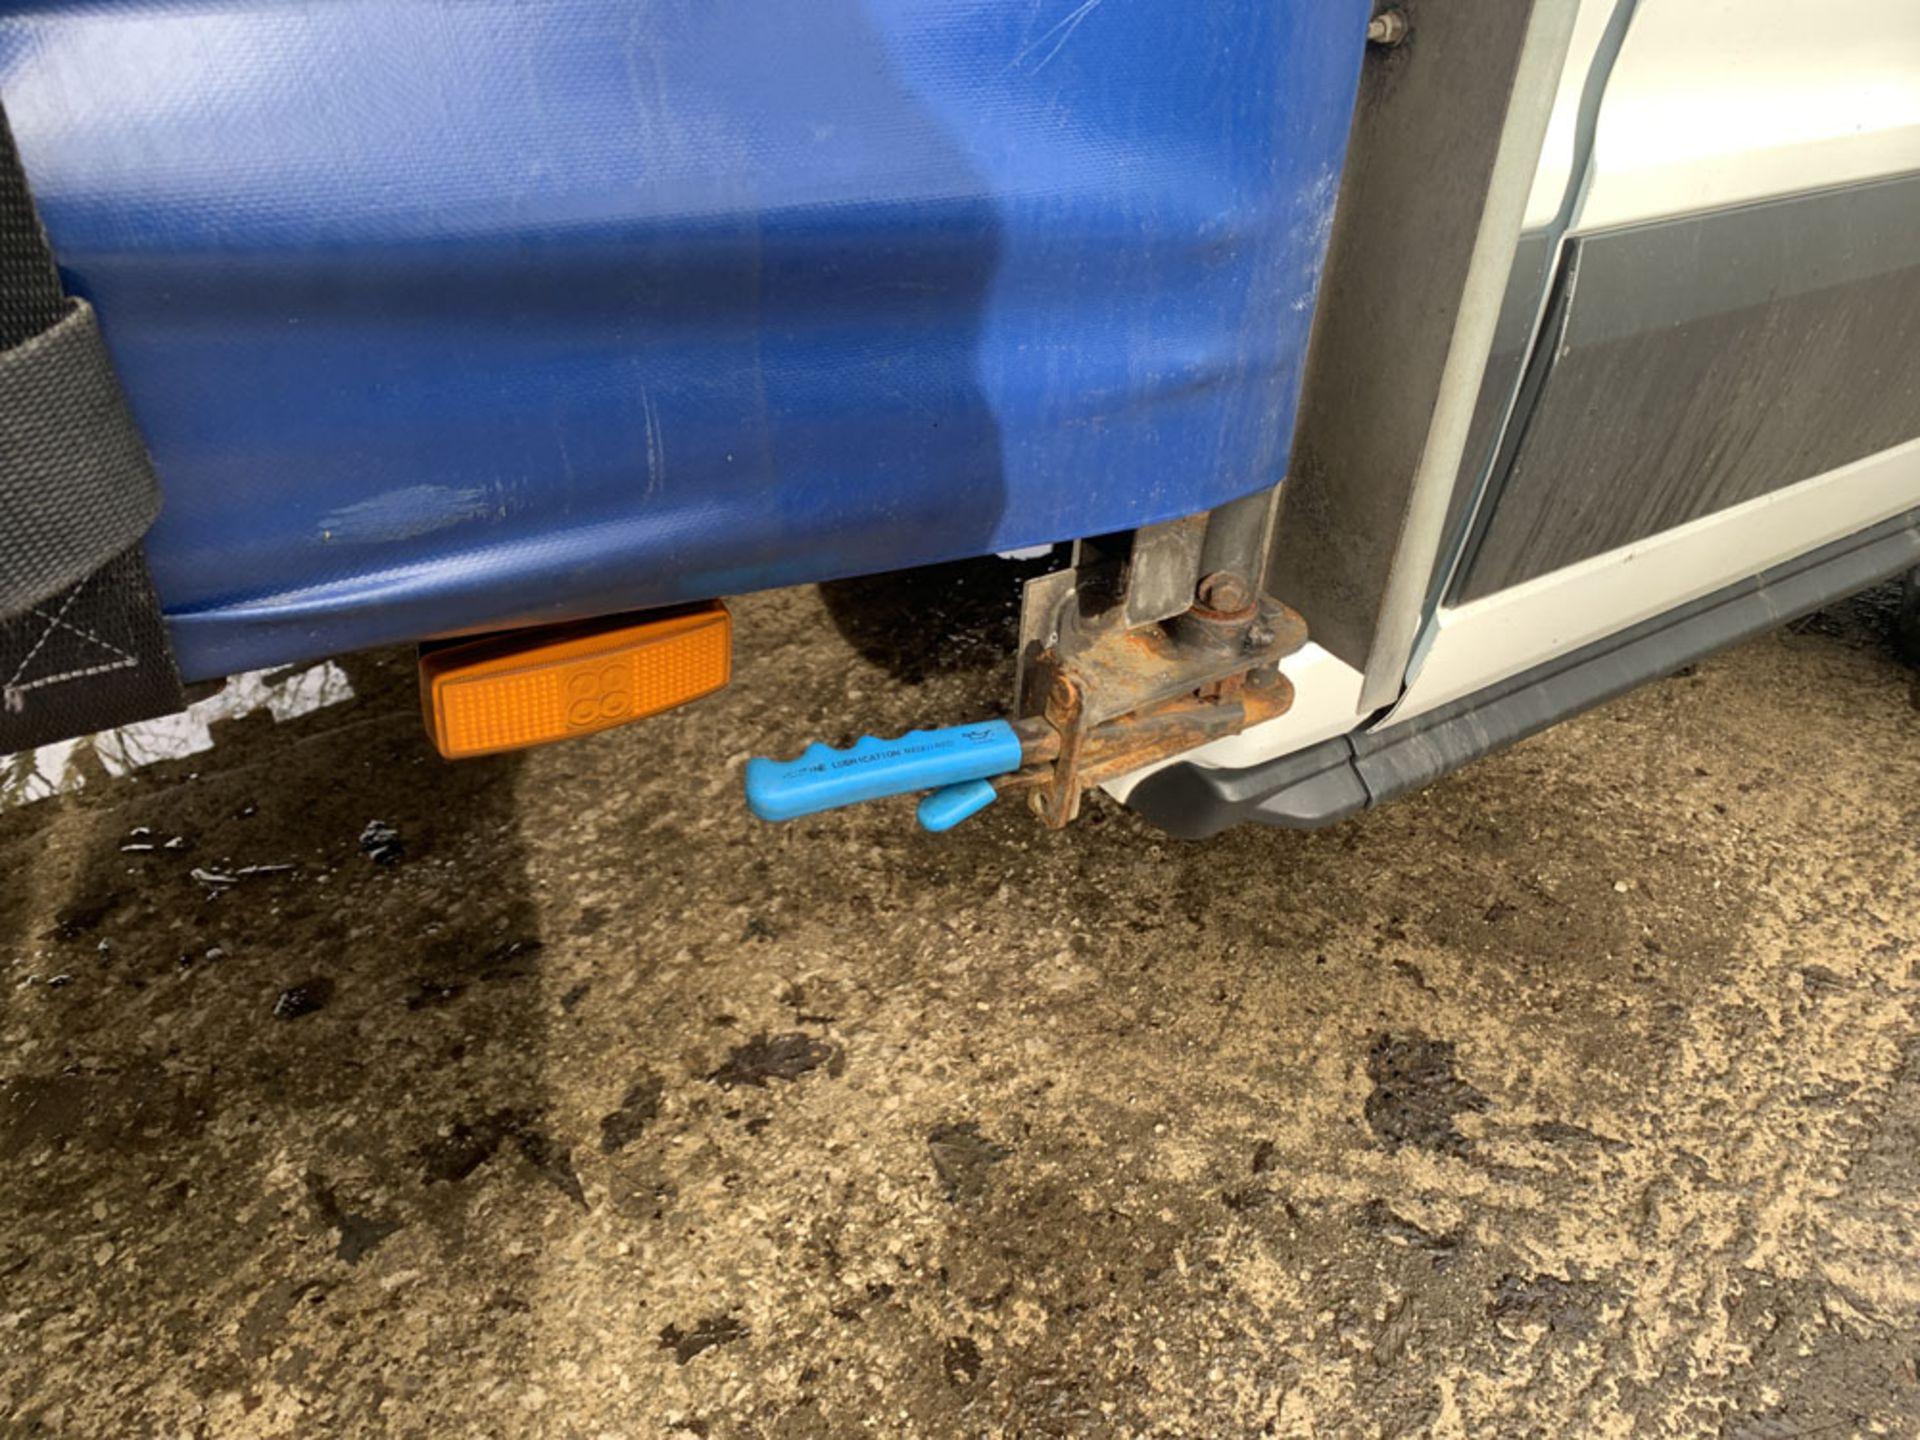 Ford Transit Curtain-Sider. 2016 (65 Reg). 152,241 Miles. 2.2 Ltr Diesel. Standard Cab. - Image 9 of 17